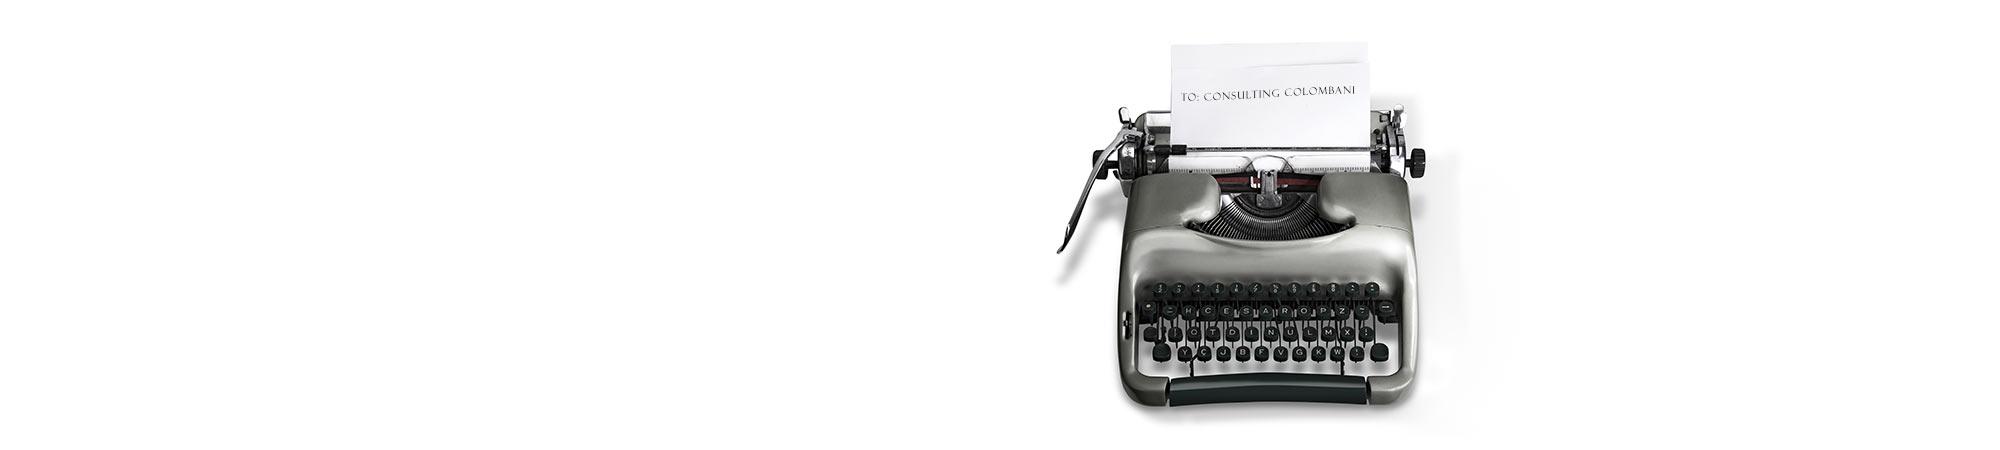 typewriter2000x450_slider